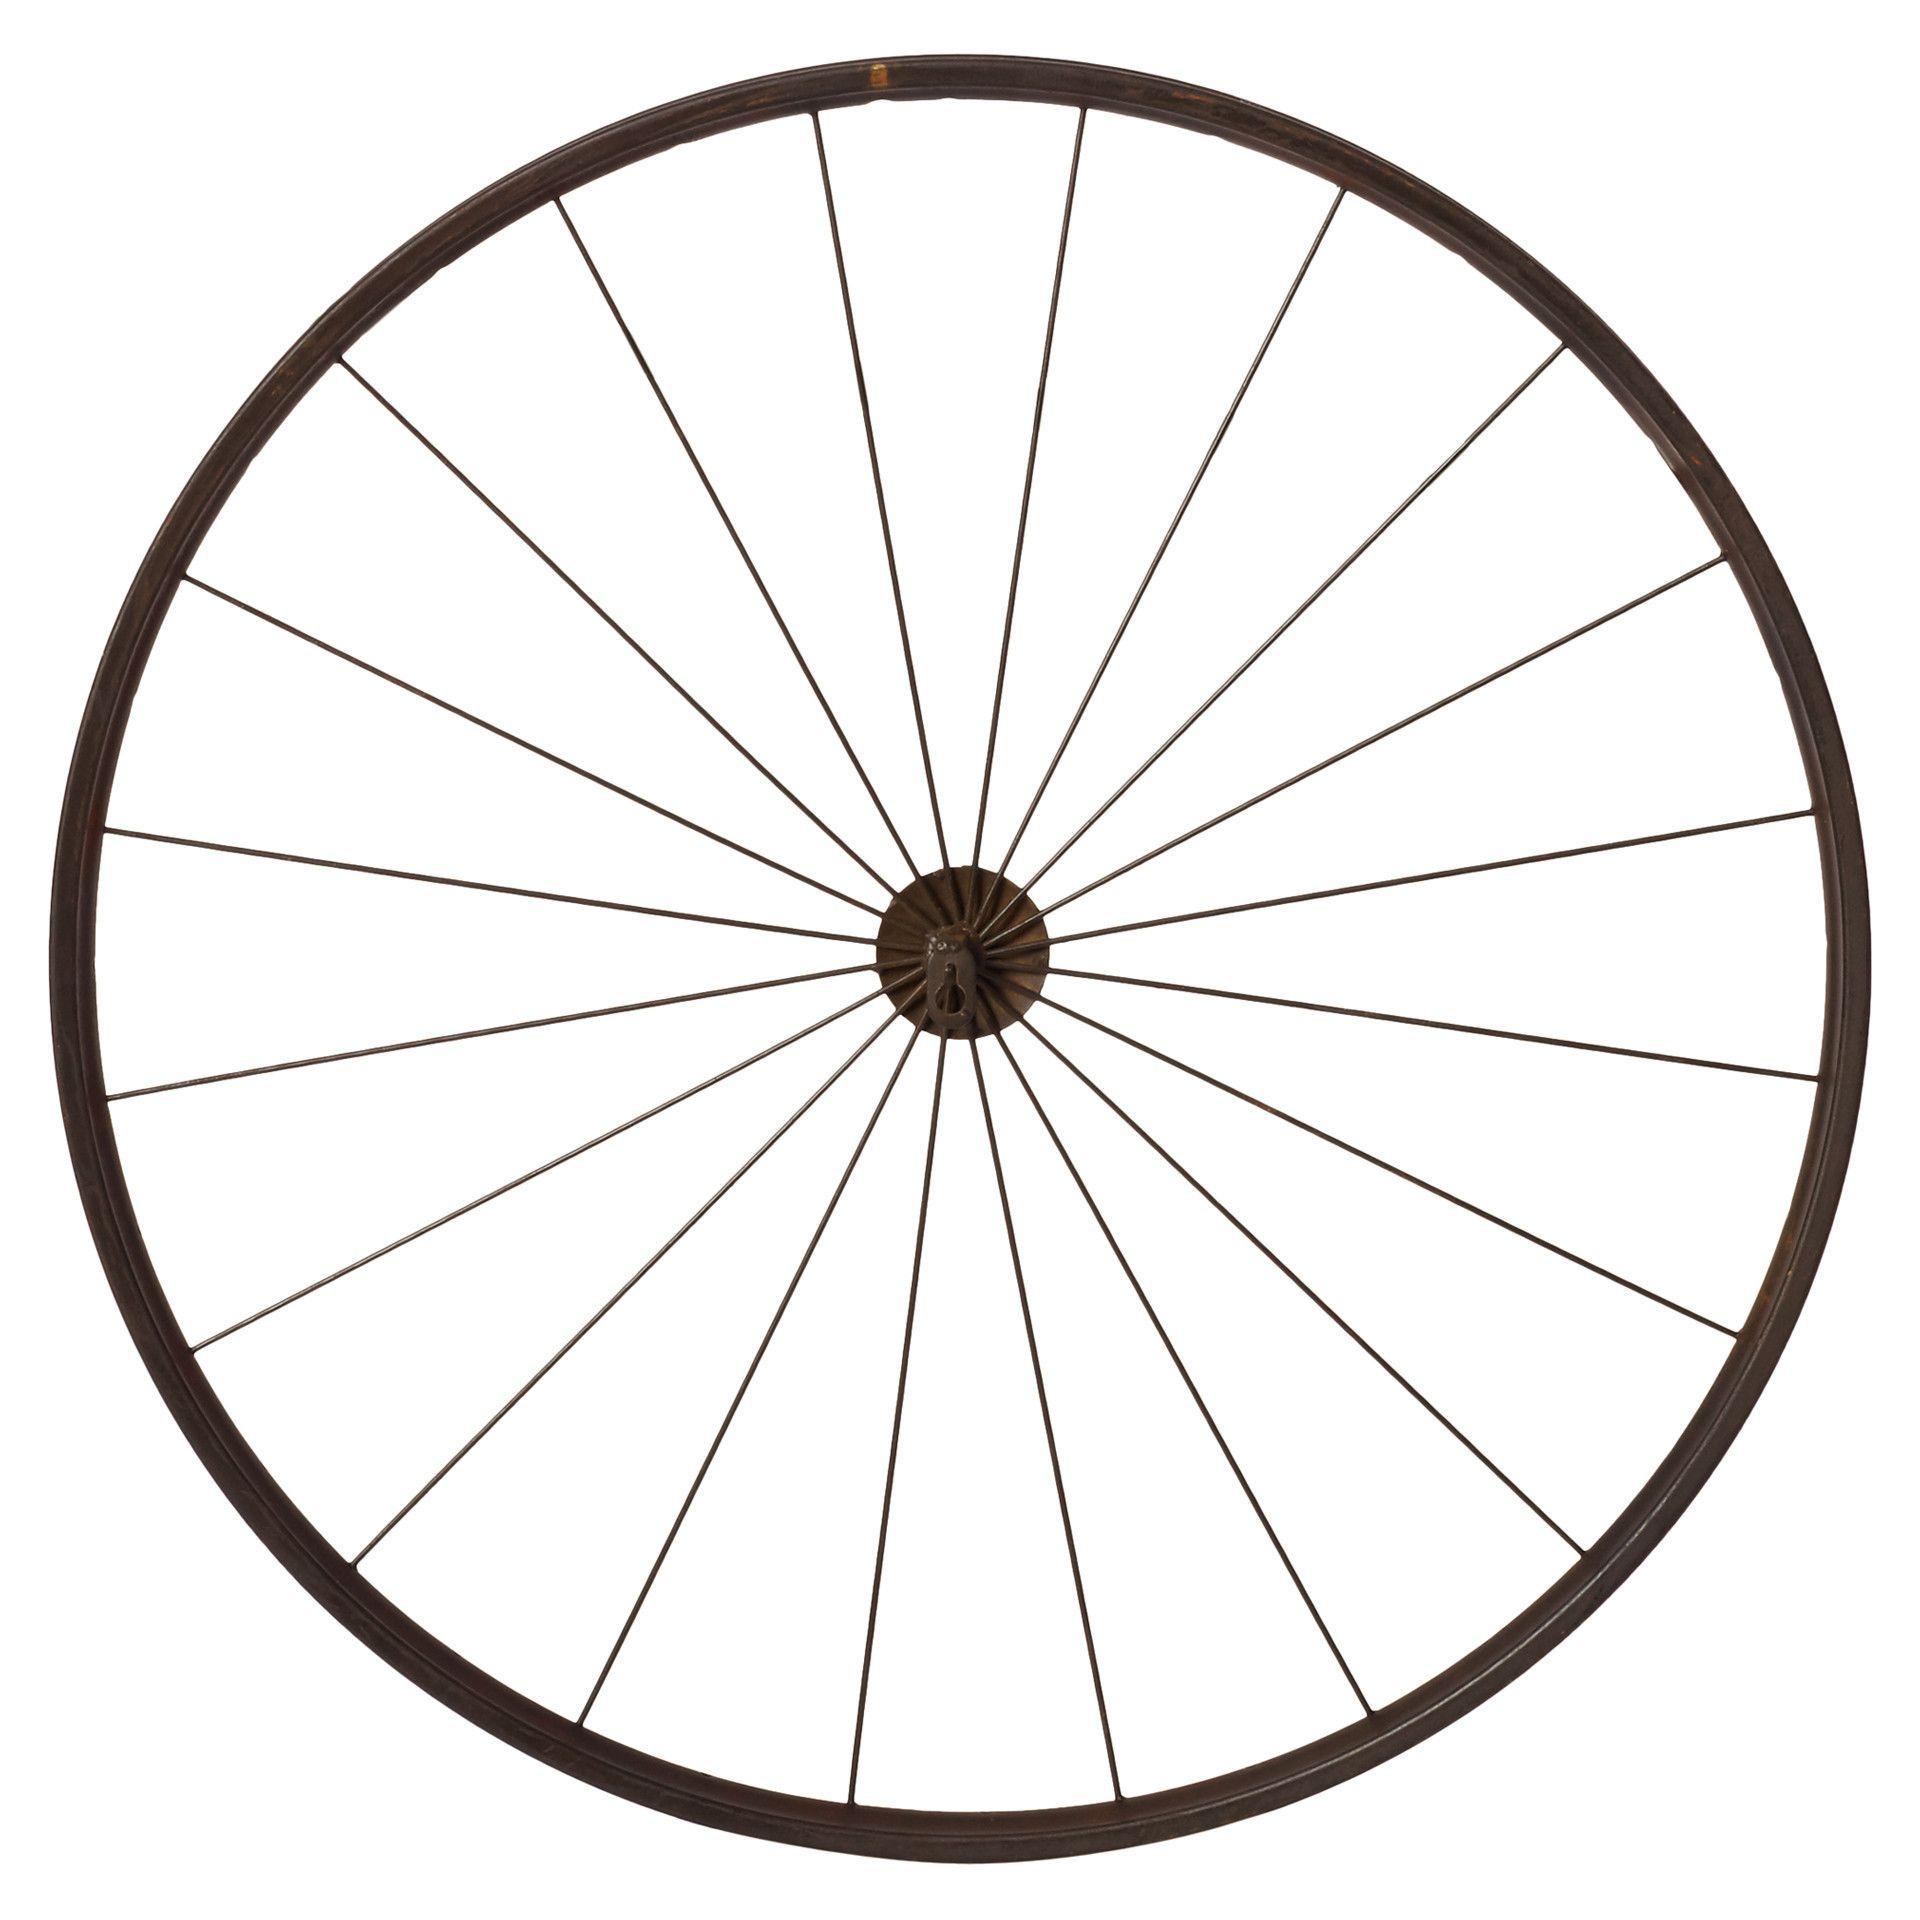 Vintage Wheel Photo Holder | Reuse Inspo | Hanging Picture intended for Millanocket Metal Wheel Photo Holder Wall Decor (Image 29 of 30)